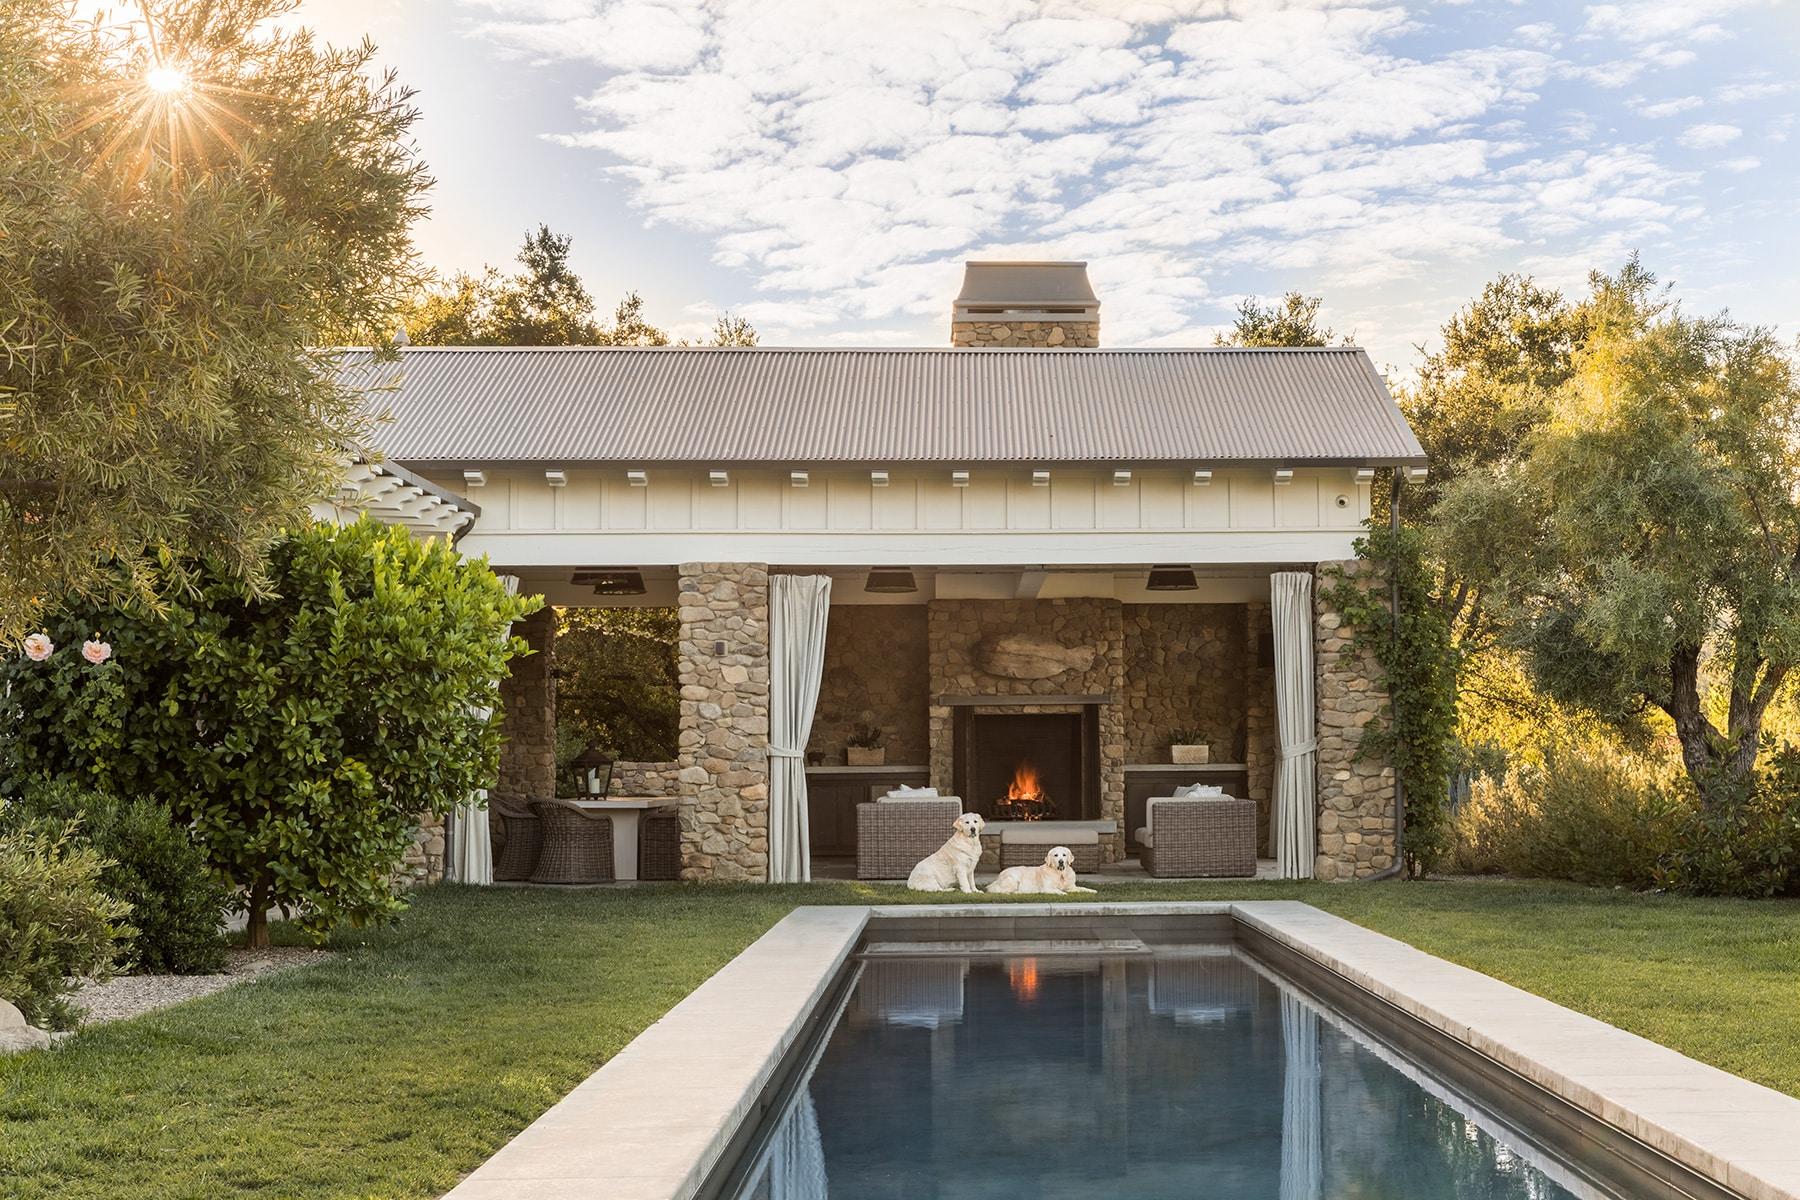 Ojai garden and pool by Scott Shrader